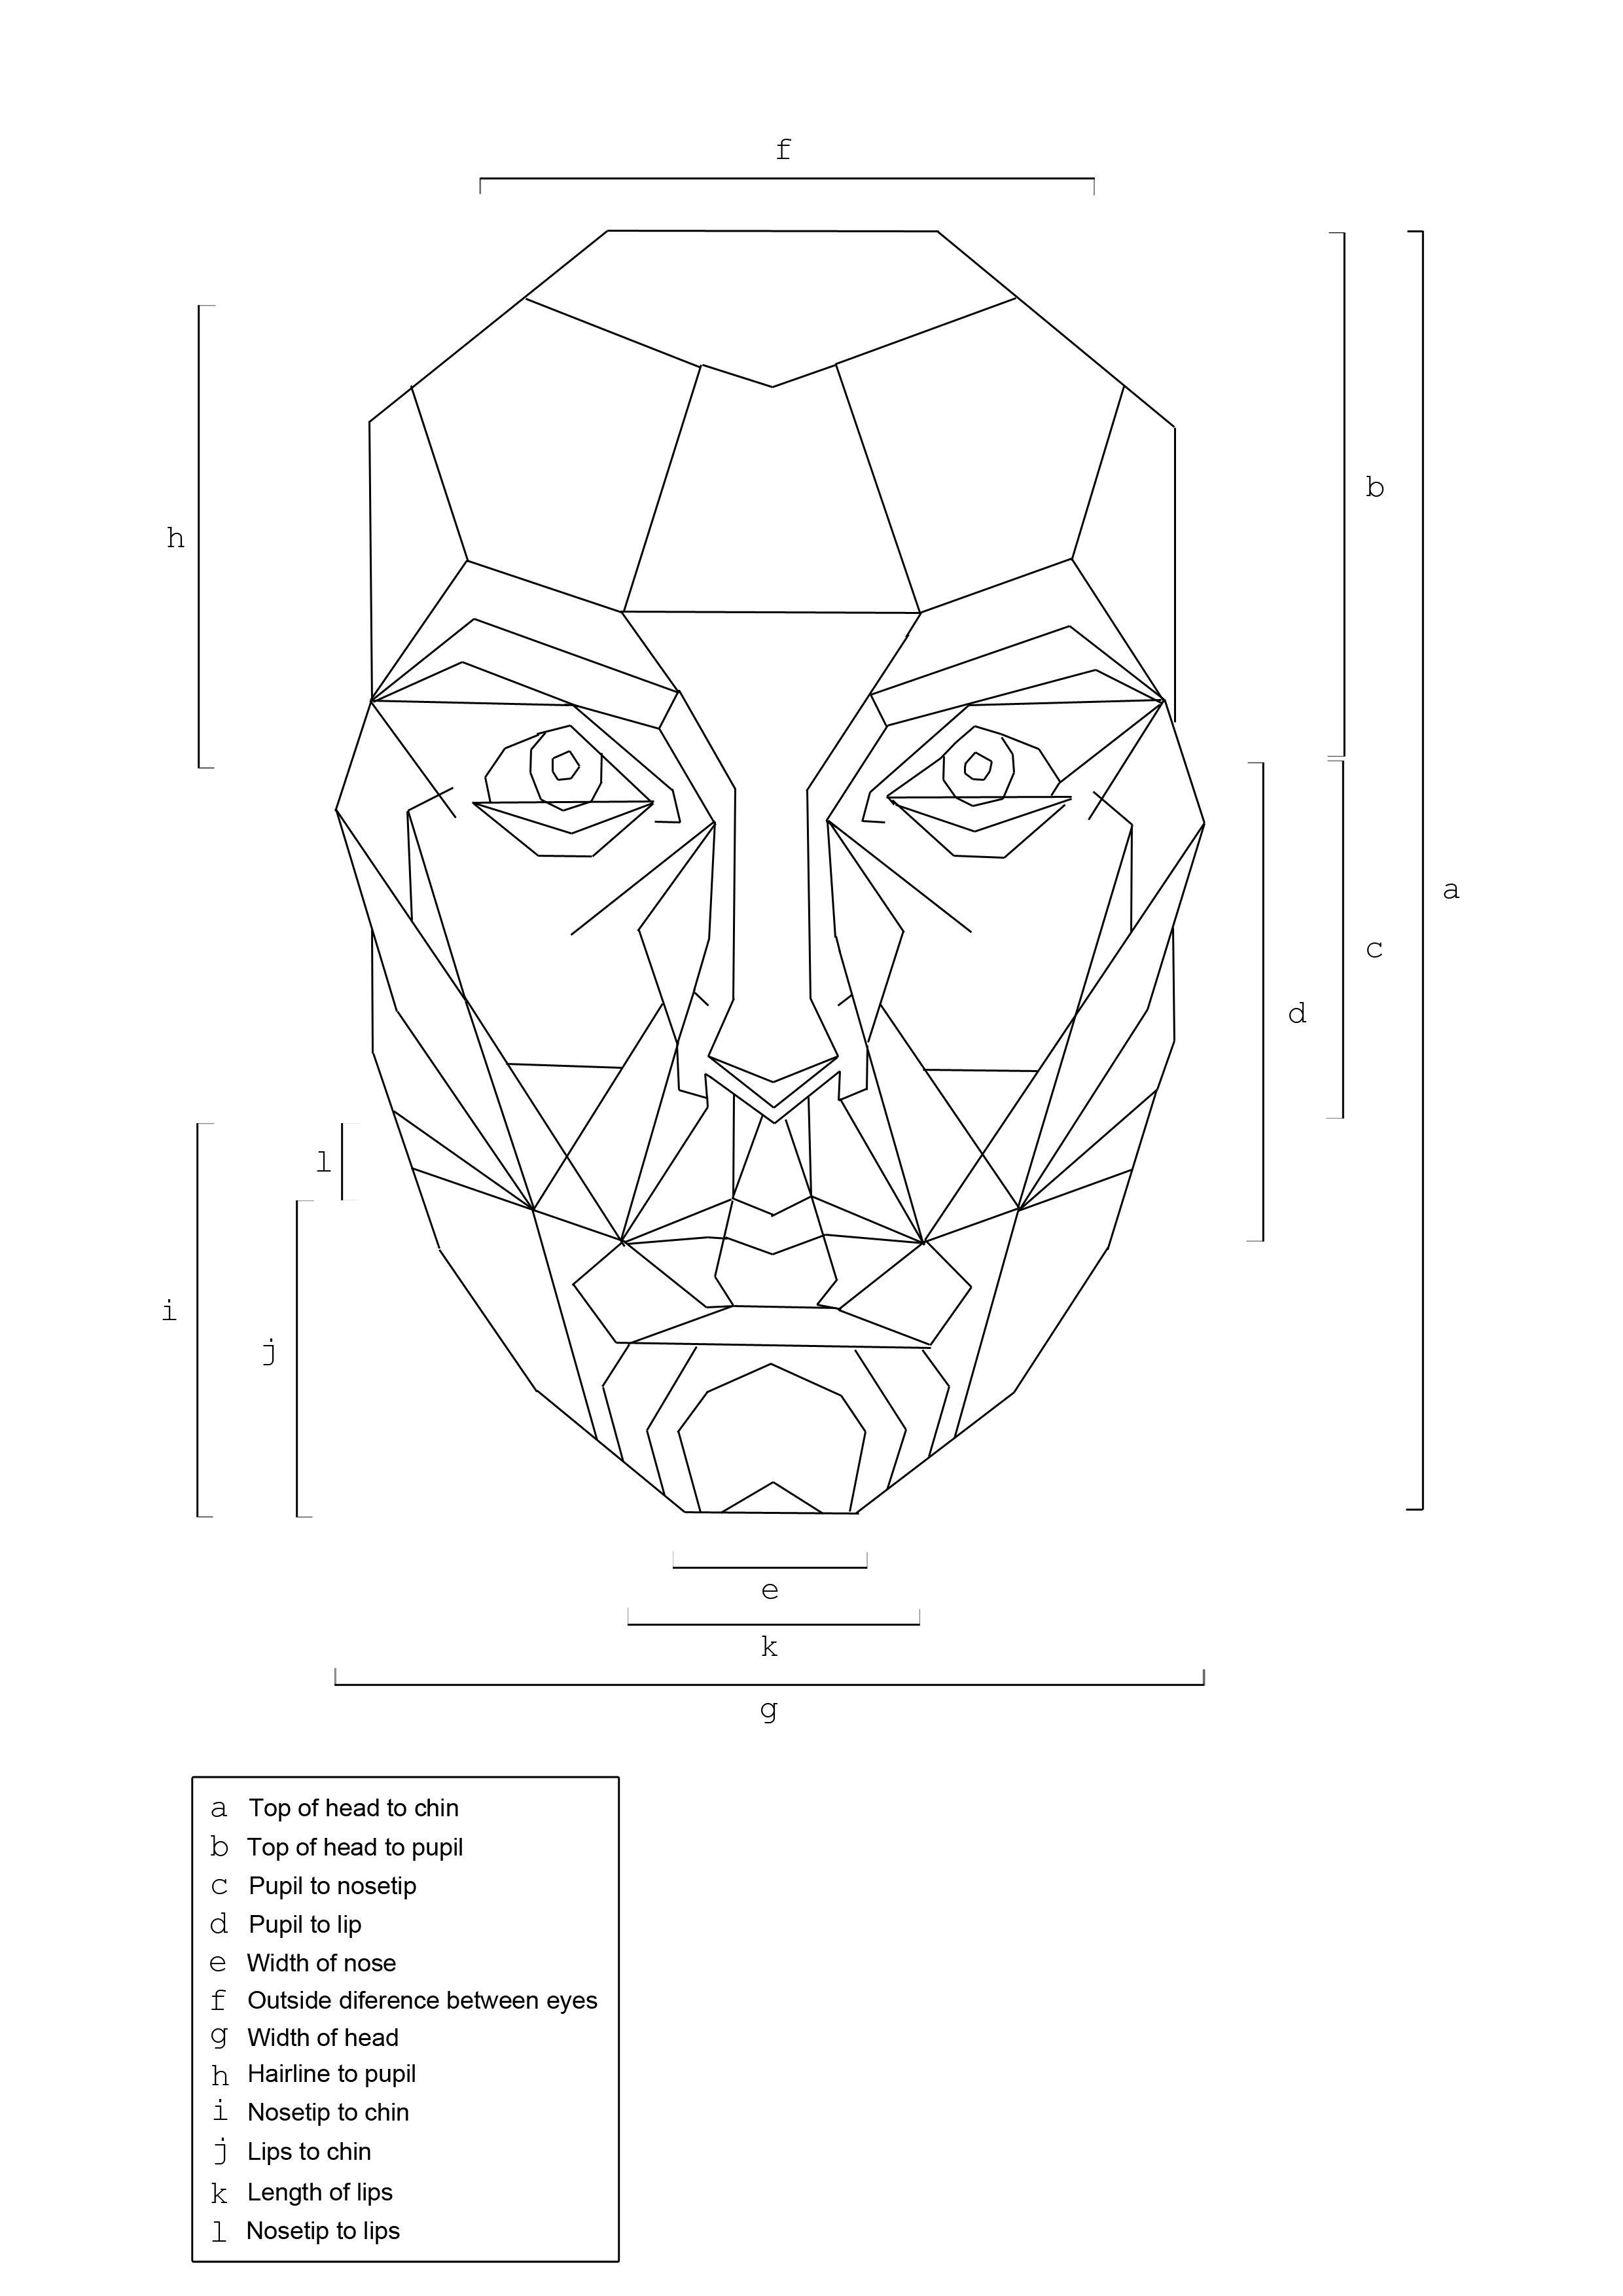 Golden Ratio Head Measurements And Textg 24803508 Anatomy